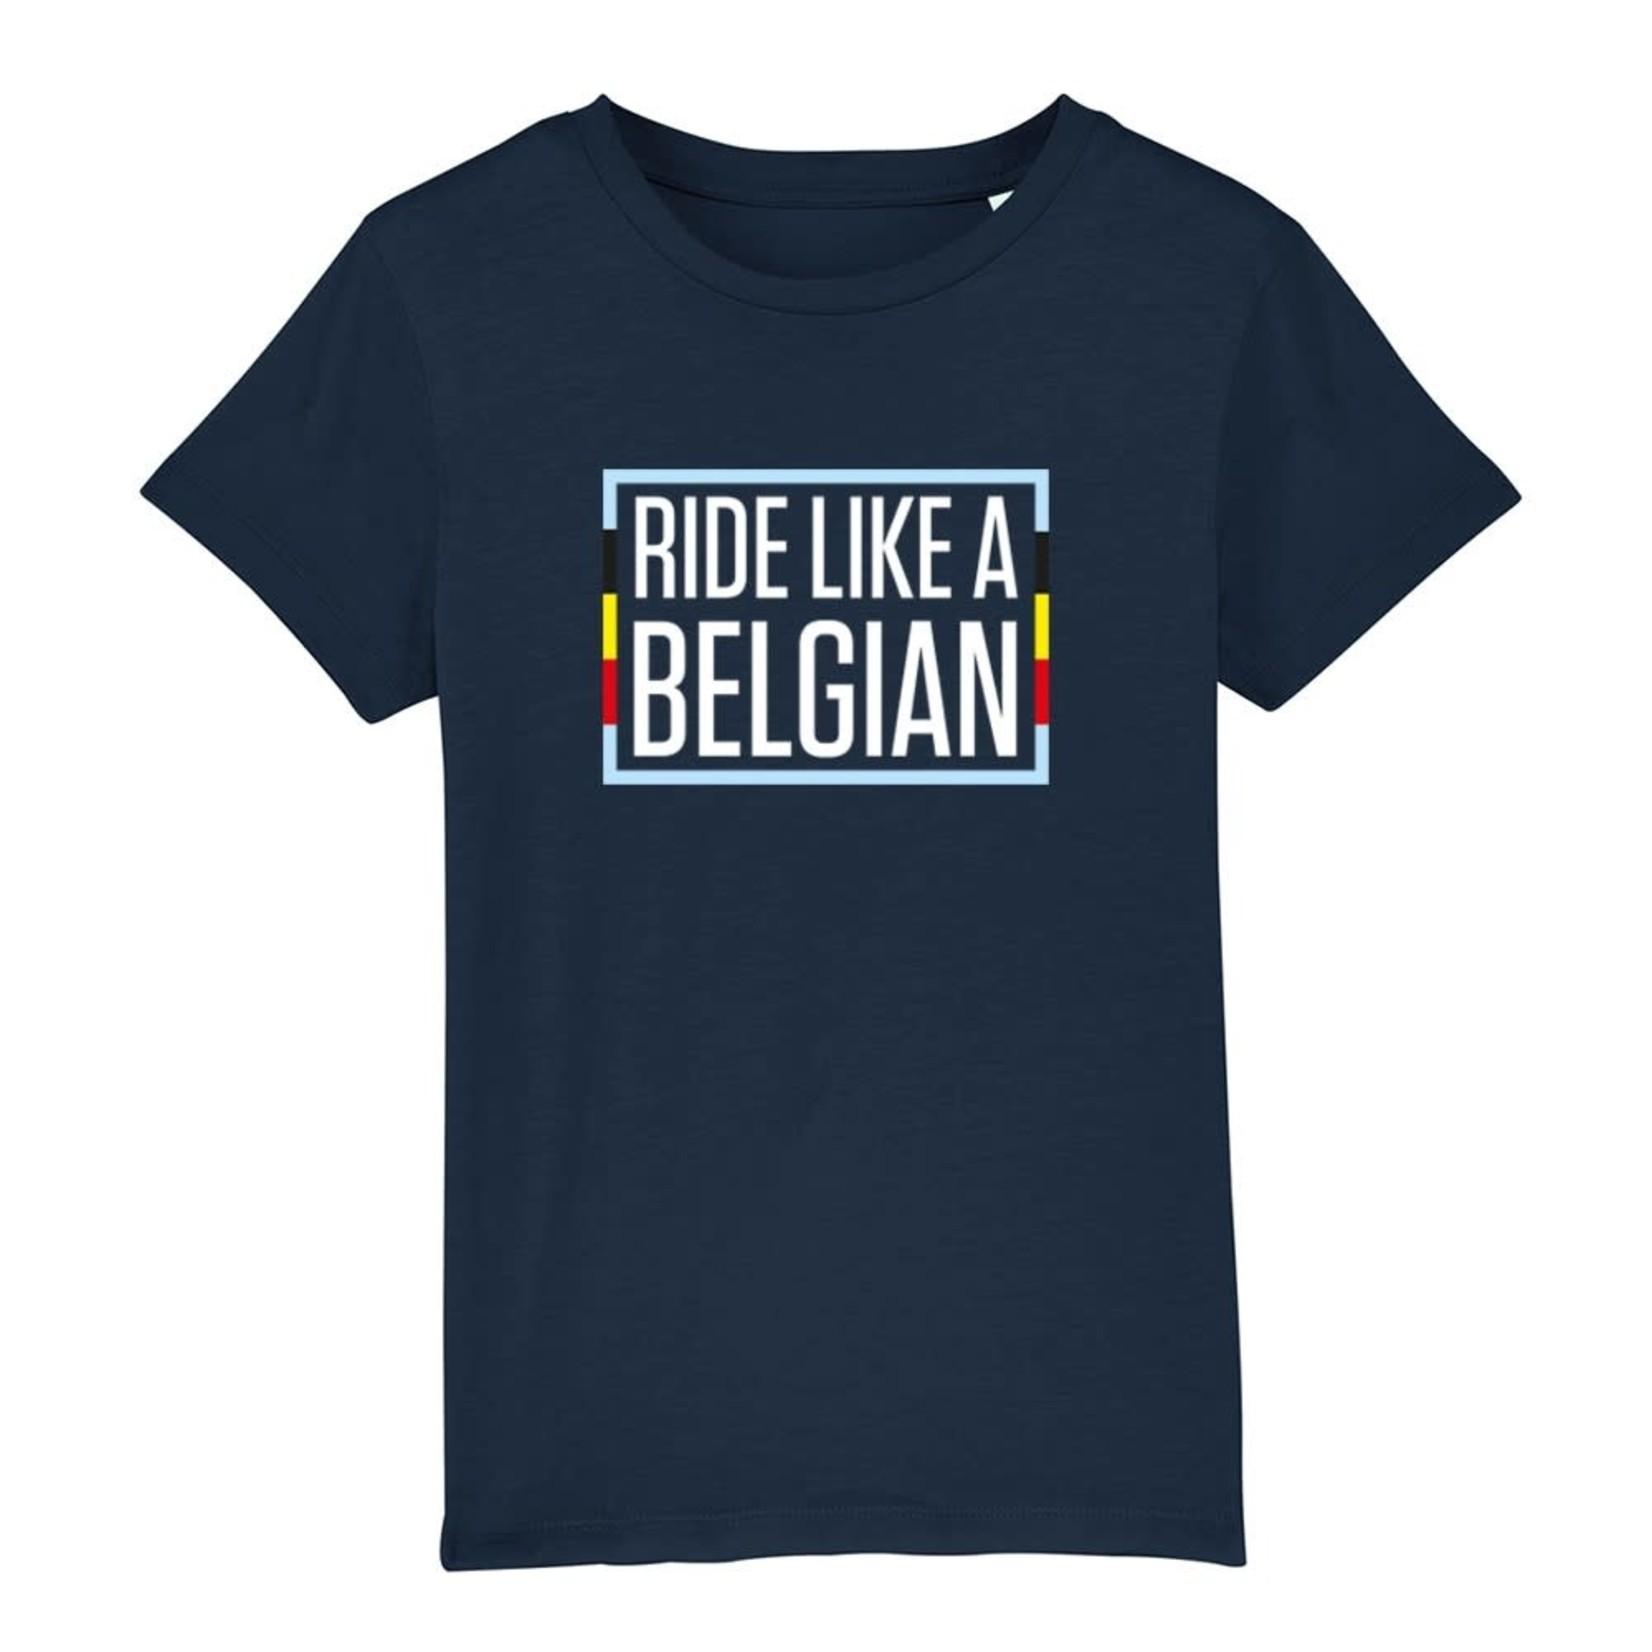 T-shirt kids 'Ride like a Belgian'